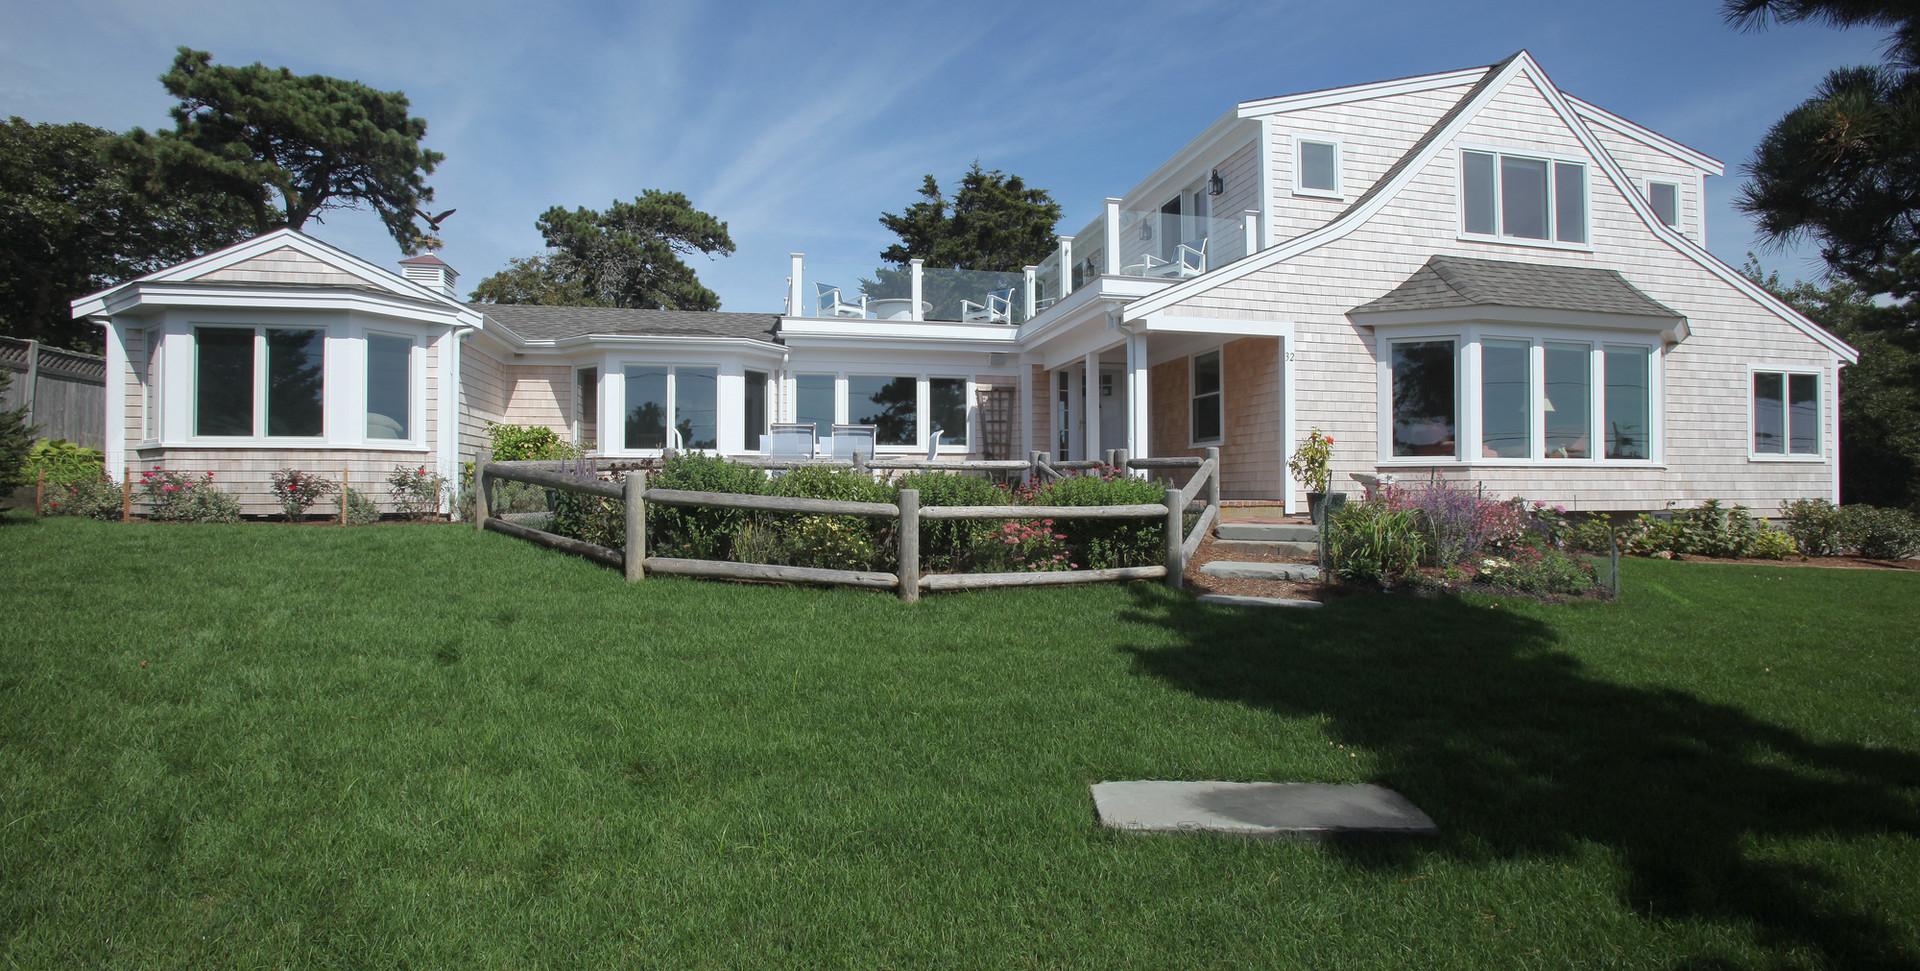 Ridgevale Beach, West Chatham, MA, Home Remodel, New Dormers